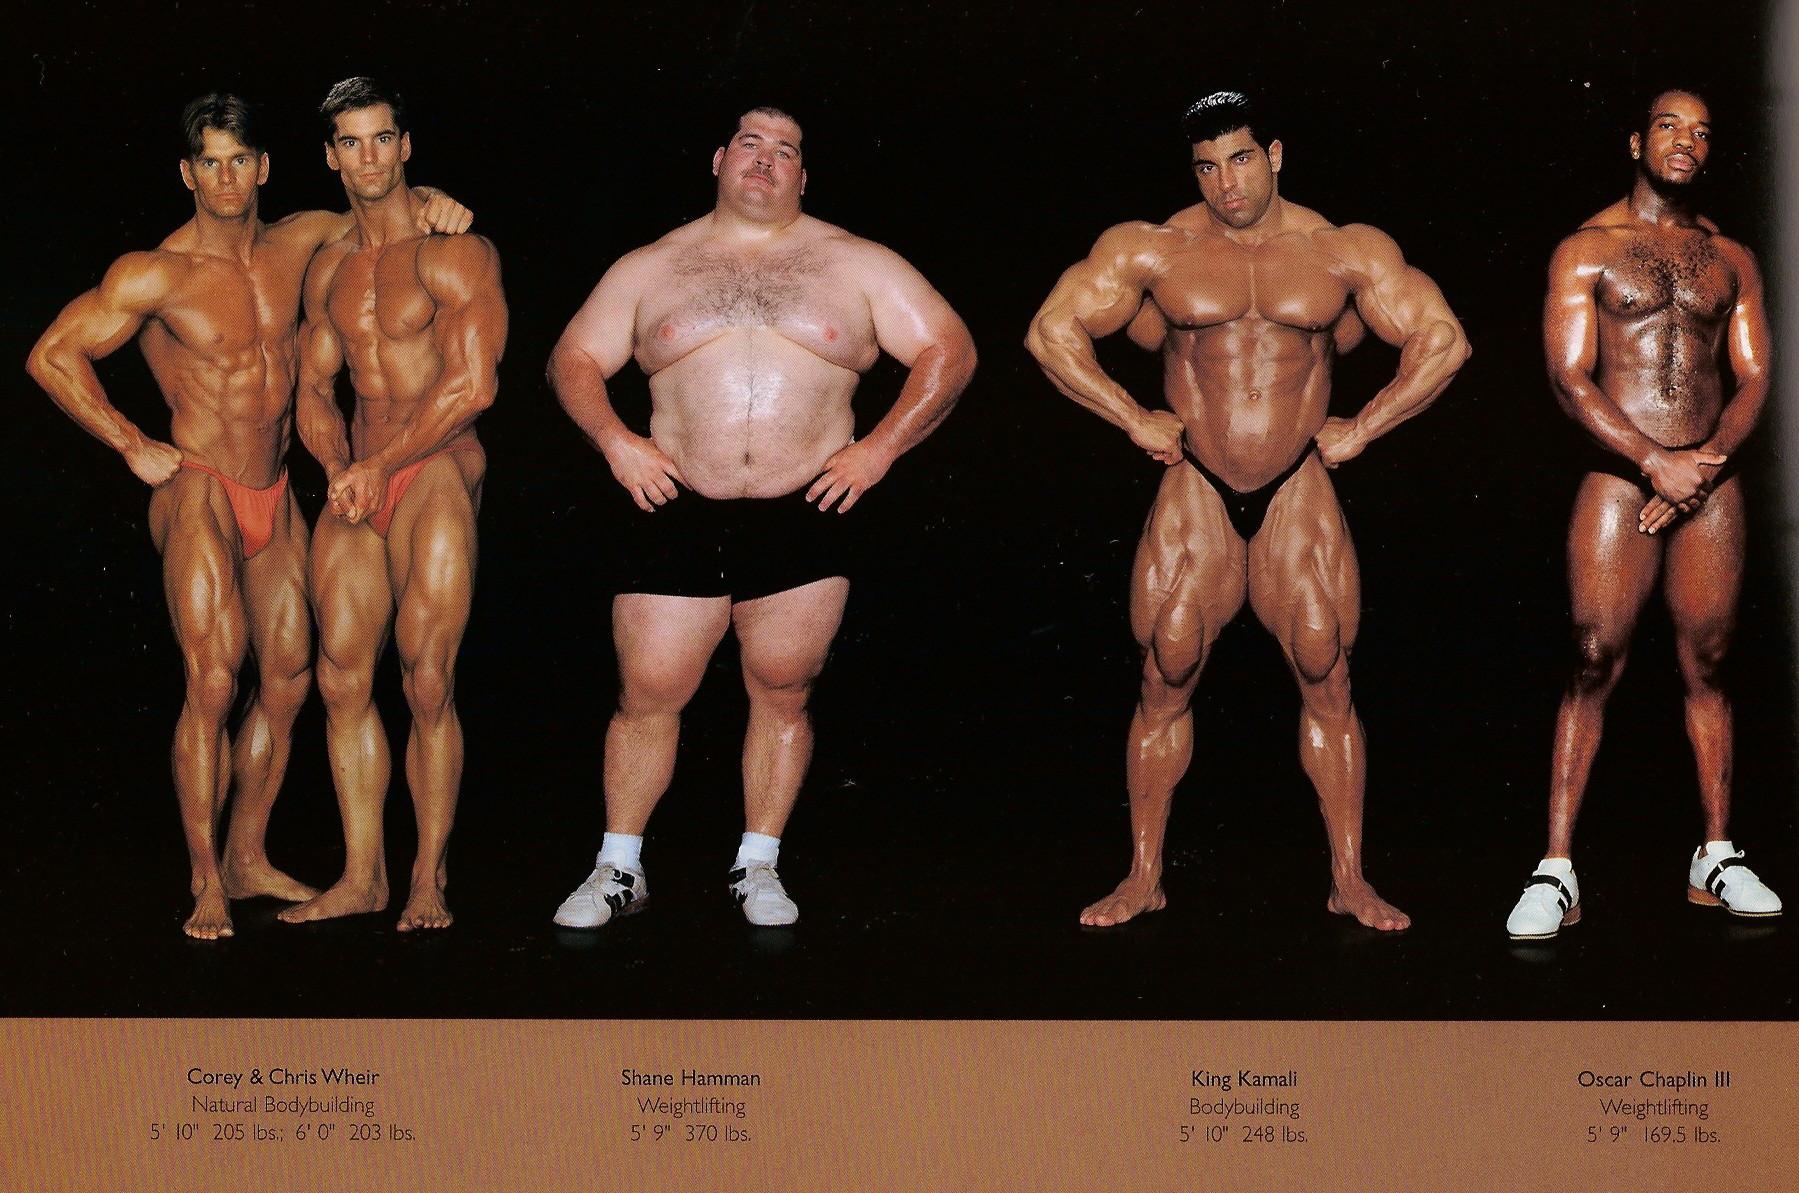 Howard Schatz / слева направо: бодибилдинг, вейтлифтинг, бодибилдинг, вейтлифинг.